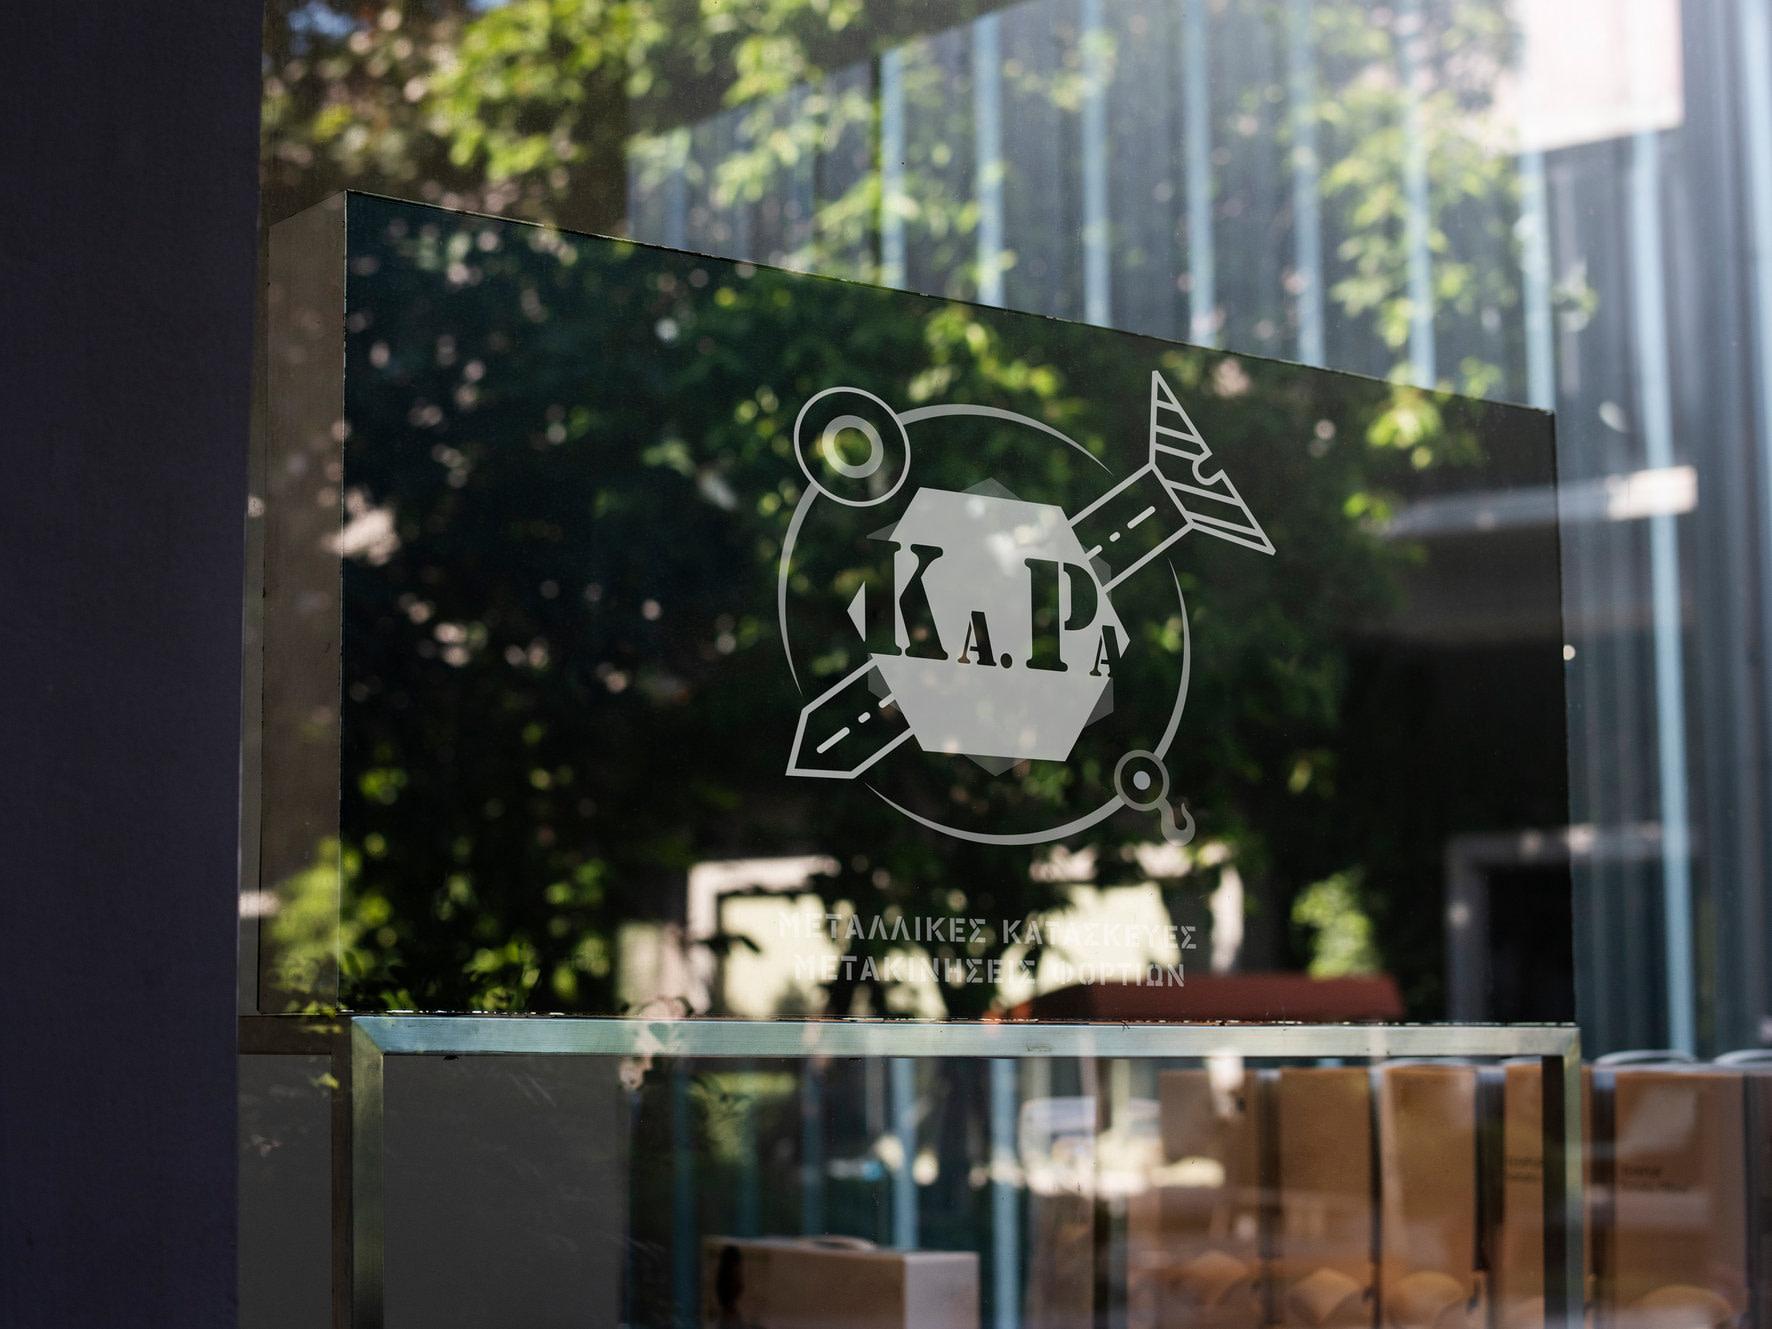 kapa1